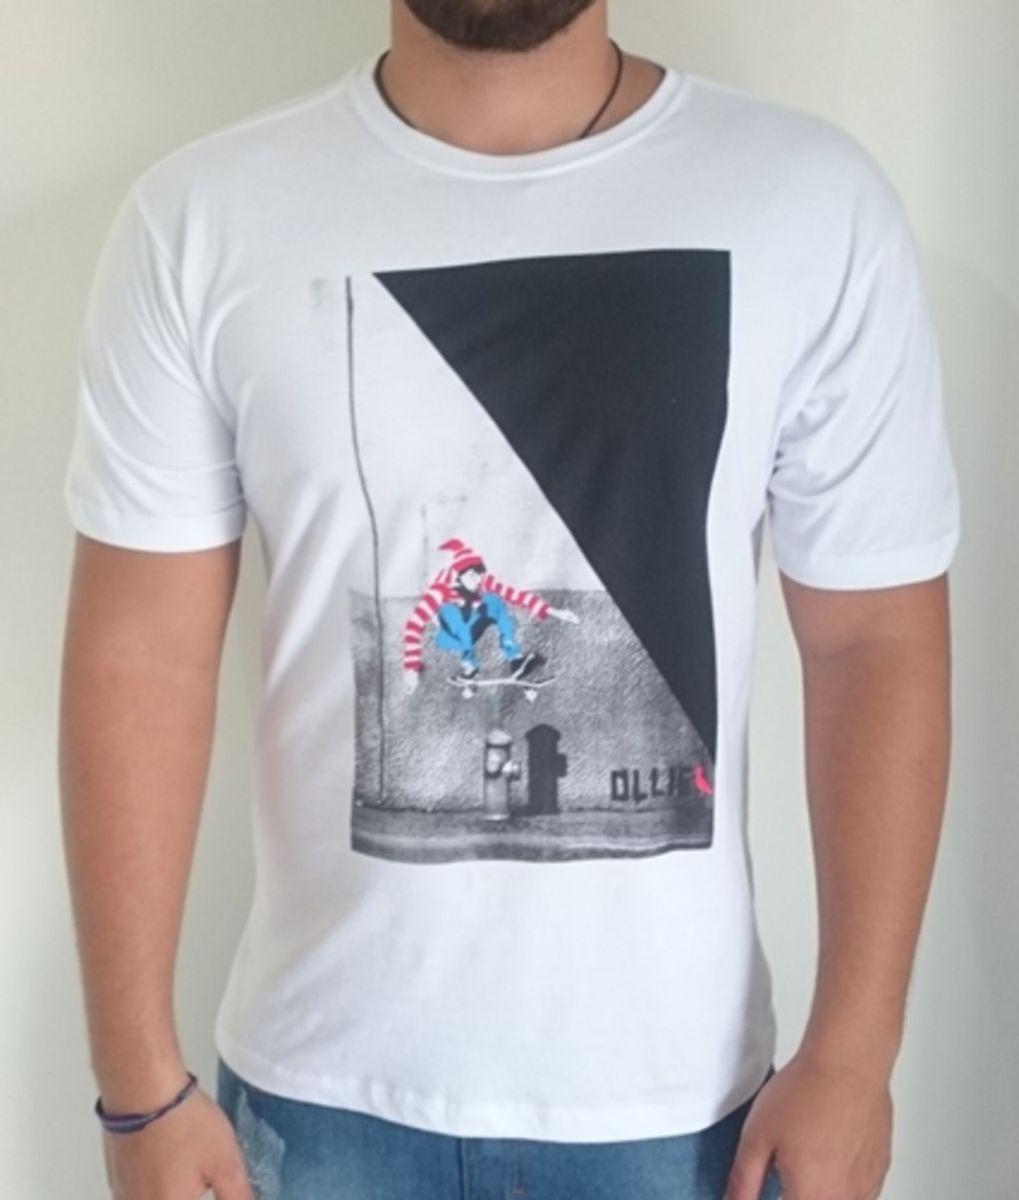 684d65cfb5 camiseta reserva onde está wally  79 - camisetas reserva